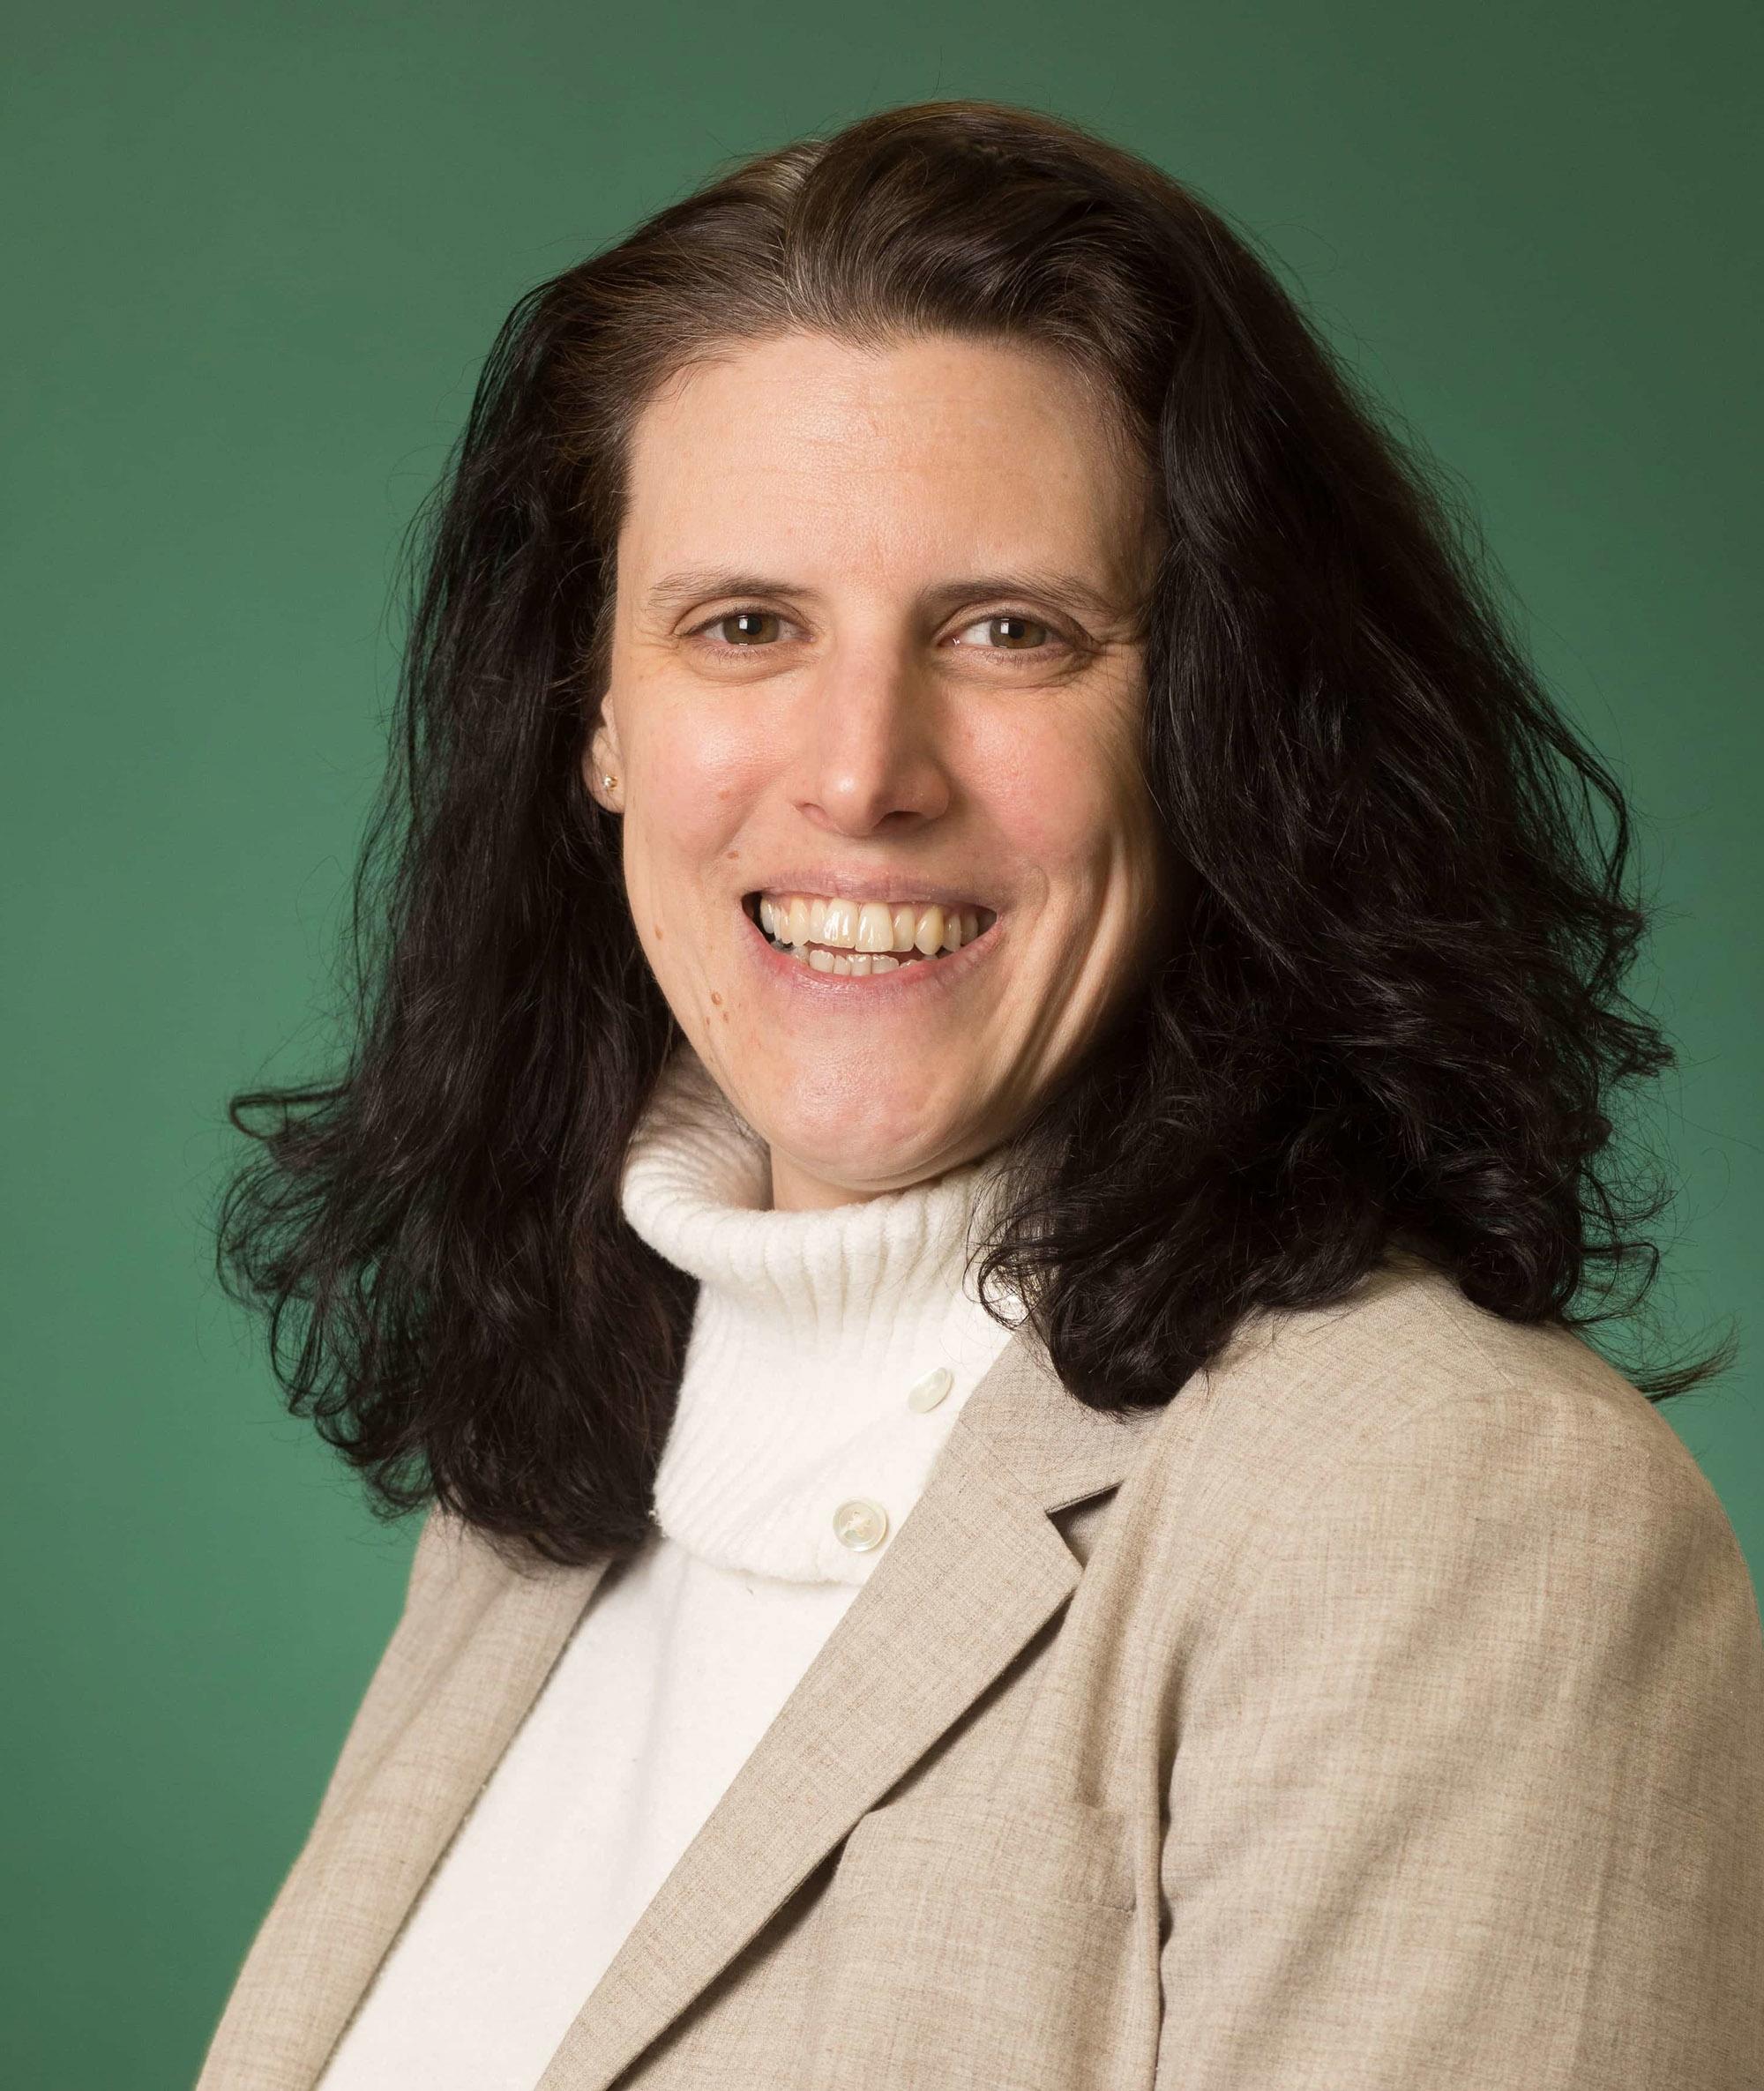 Samantha Herrick, 2019 Excellence in Teaching Award Winner